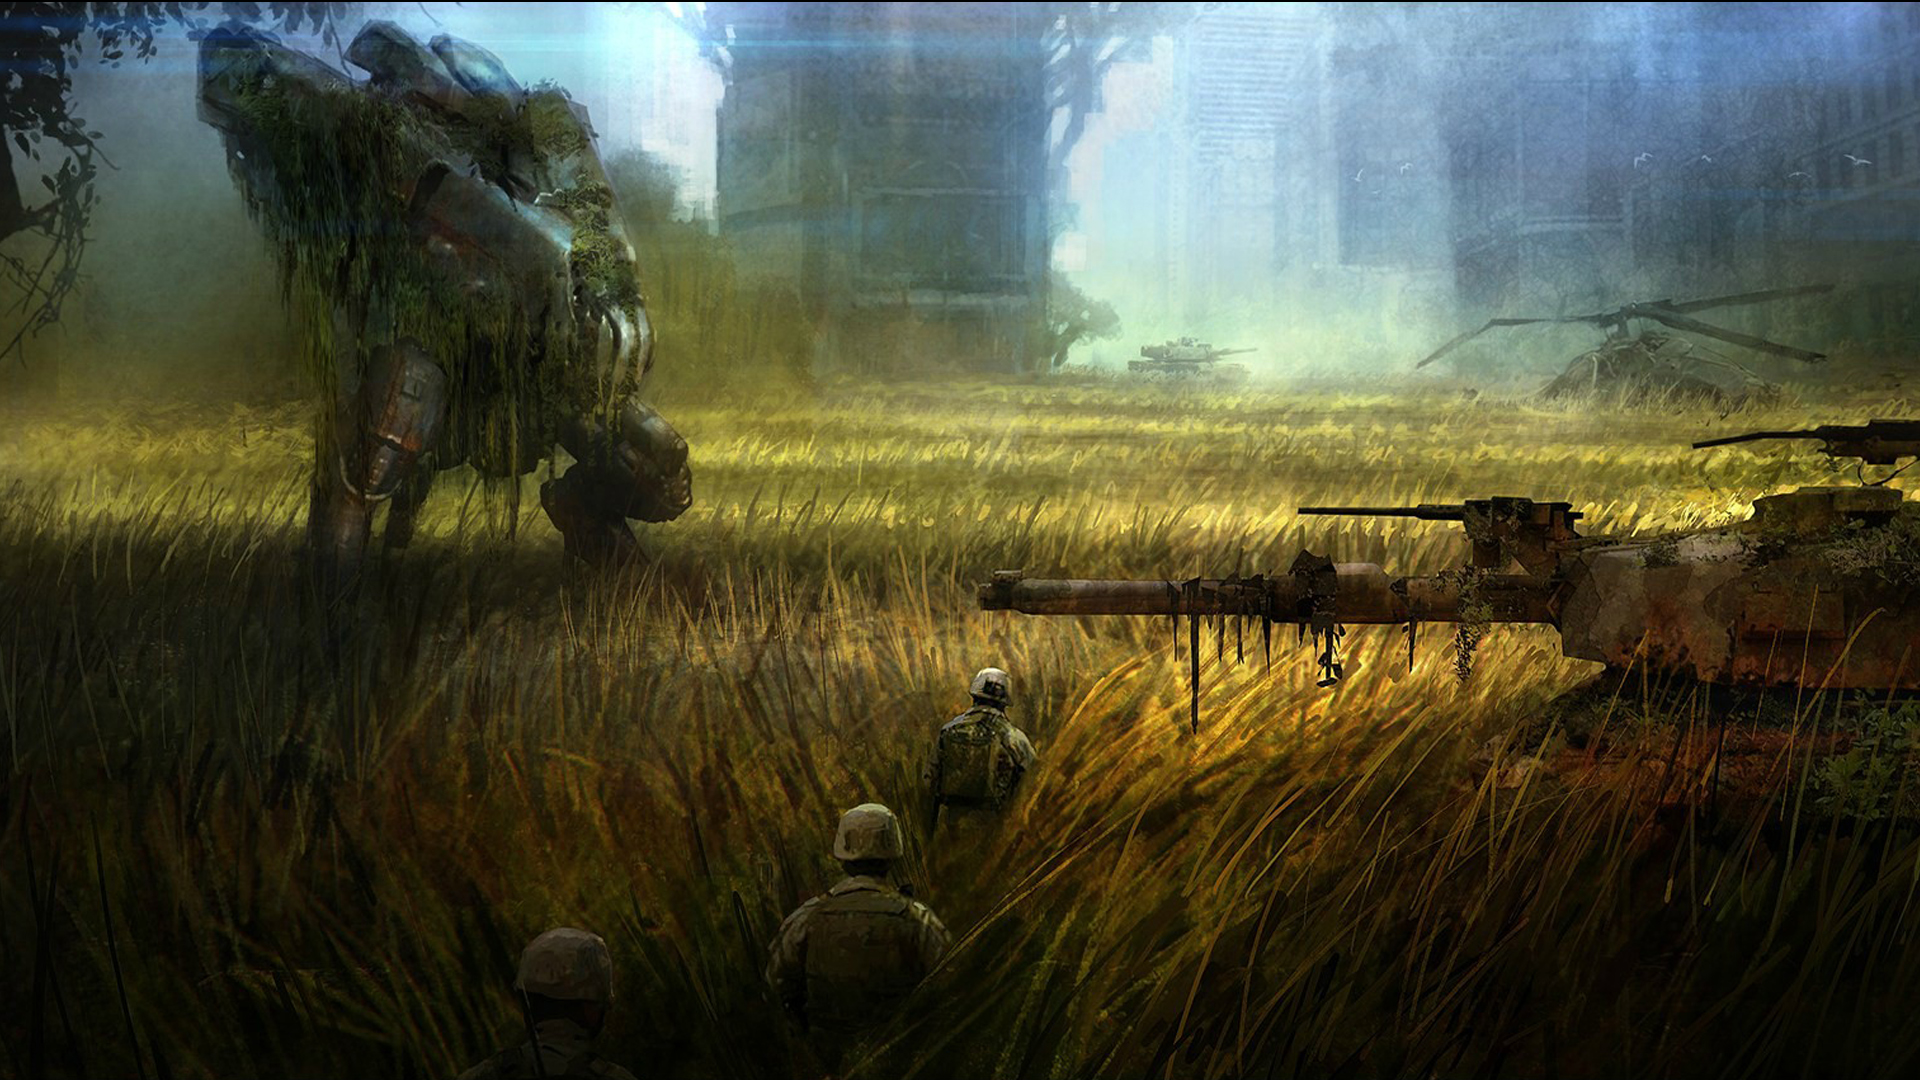 Crysis 3 hd wallpaper background image 1920x1080 id - Fantasy game wallpaper ...